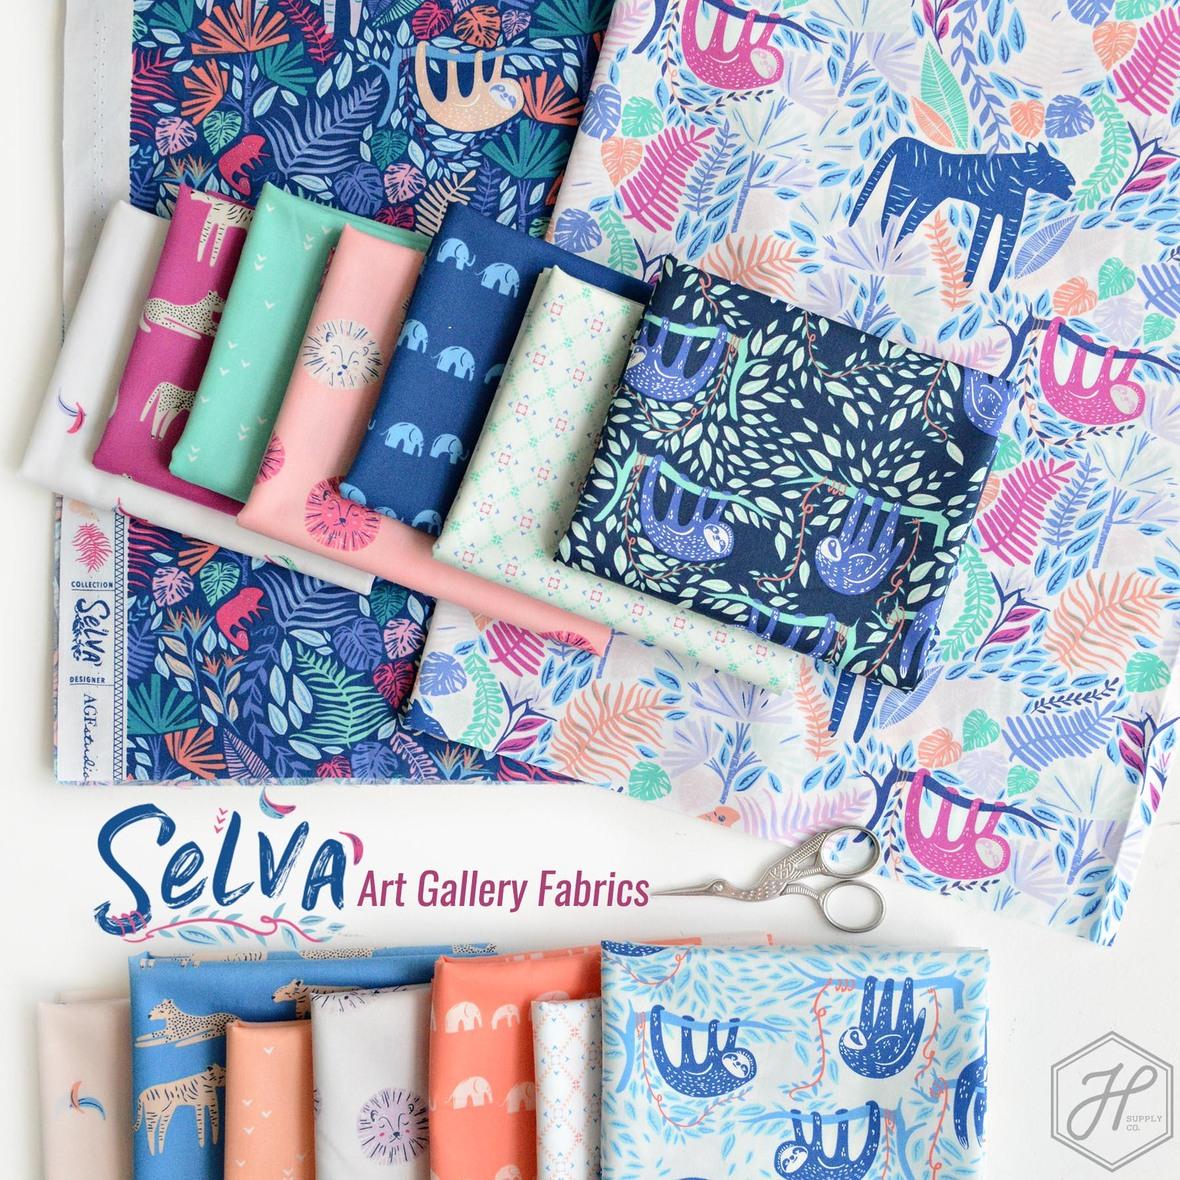 Selva Fabric Art Gallery at Hawthorne Supply Co.